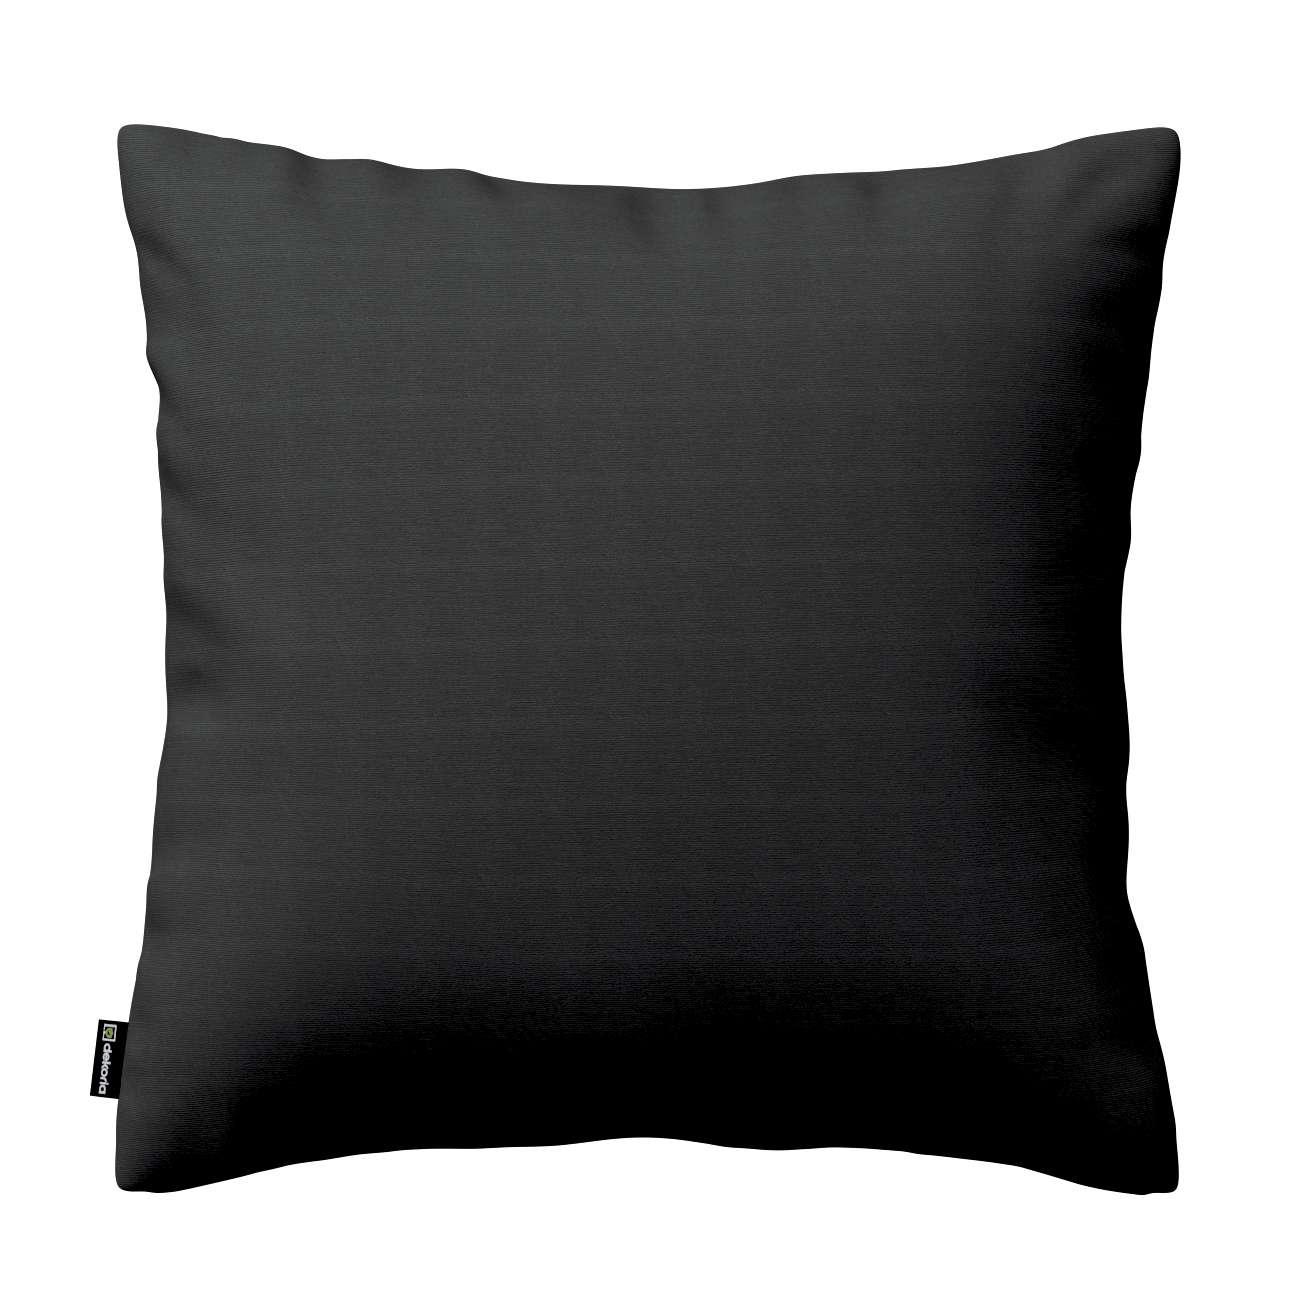 Poszewka Kinga na poduszkę w kolekcji Jupiter, tkanina: 127-99